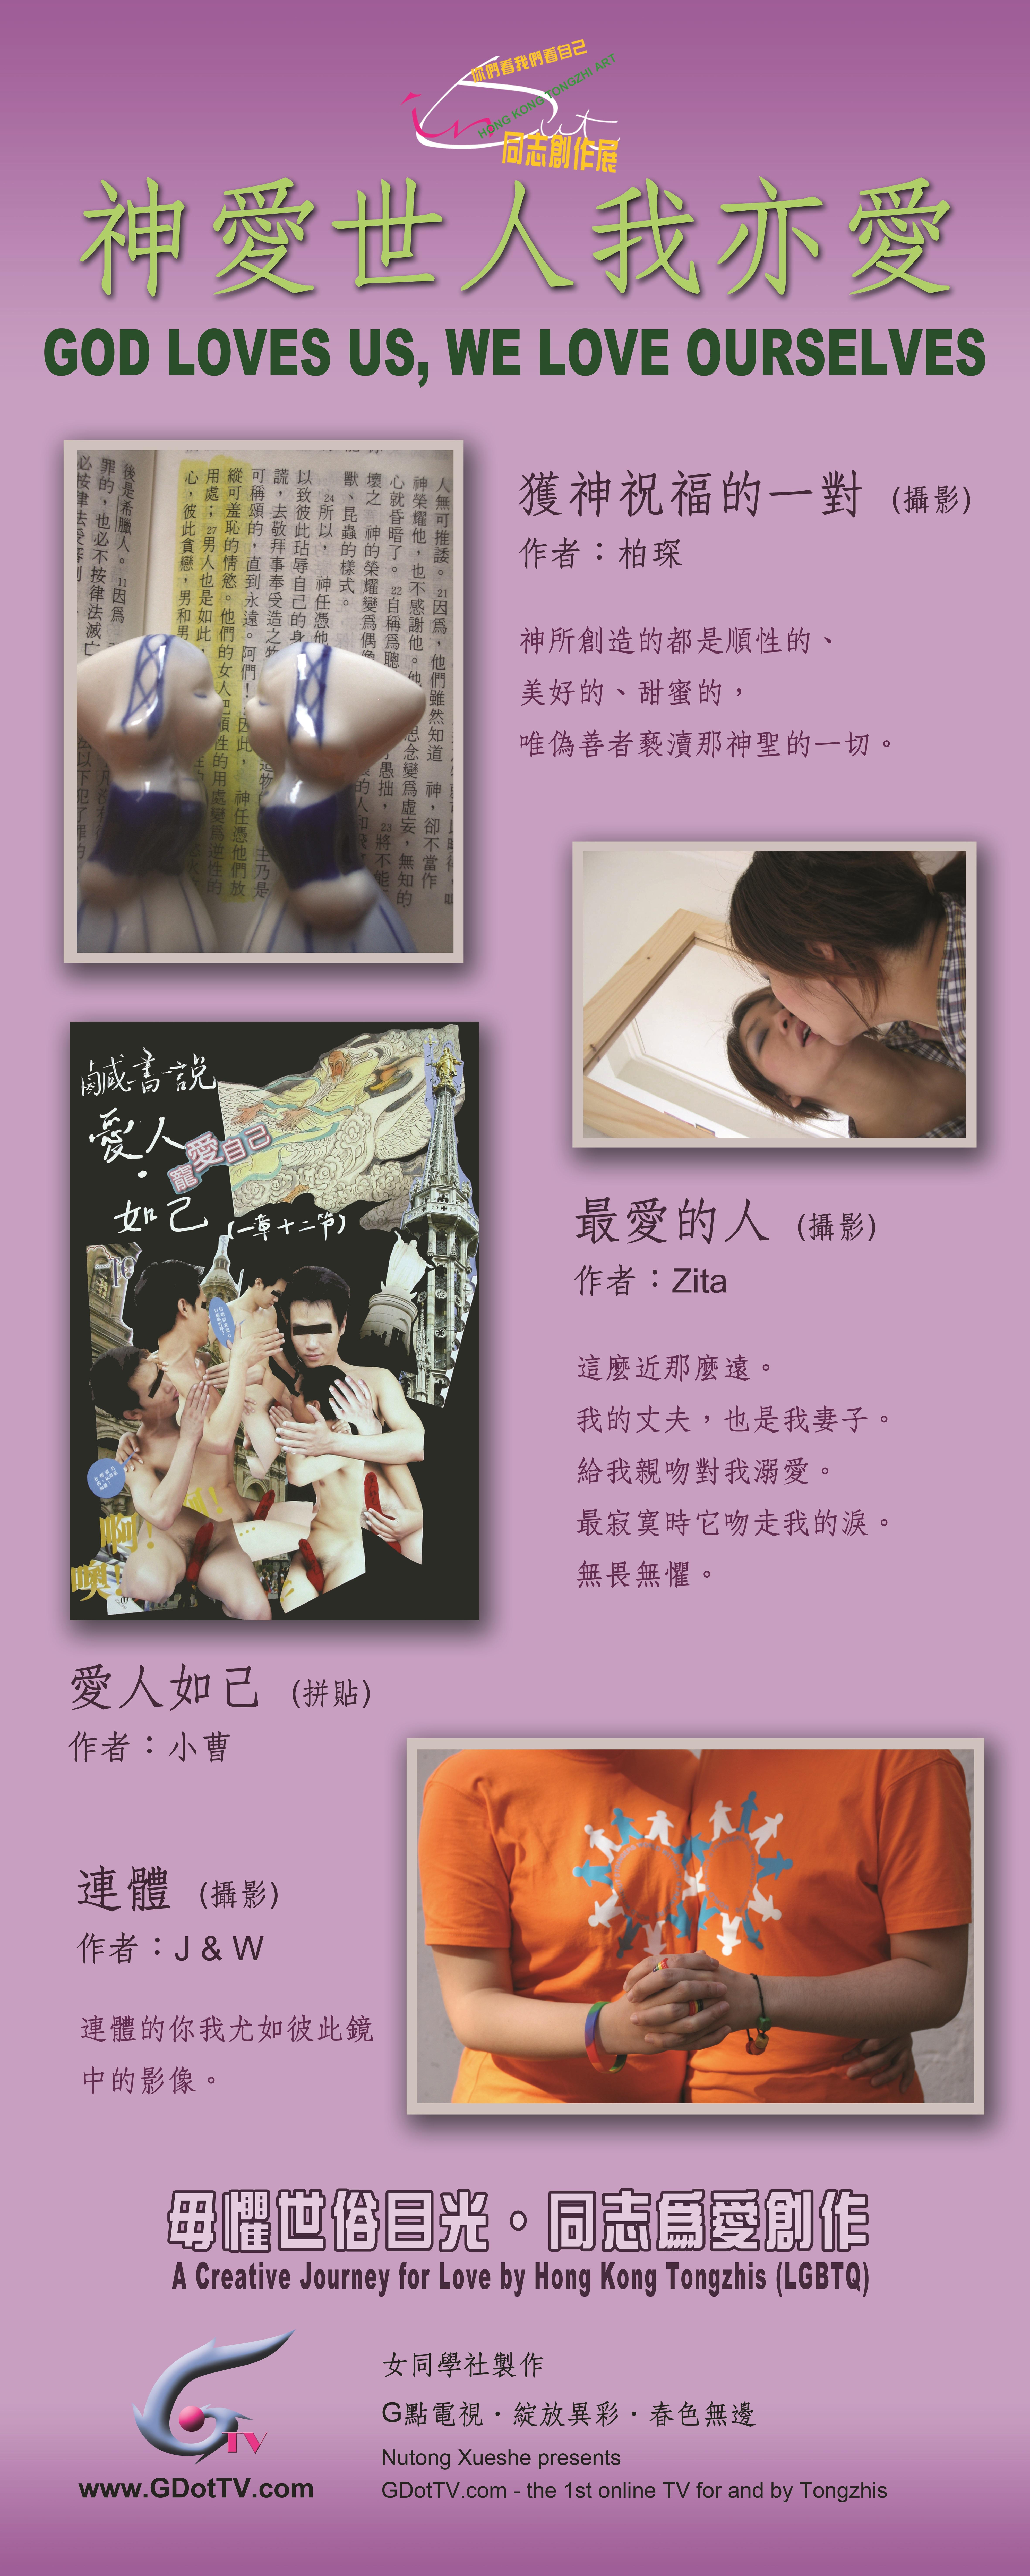 "Exhibit panel 3 for ""In/Out: 1st Hong Kong Tongzhi Art Exhibition"", Nutong Xueshe, Hong Kong Cultural Center, 2007"